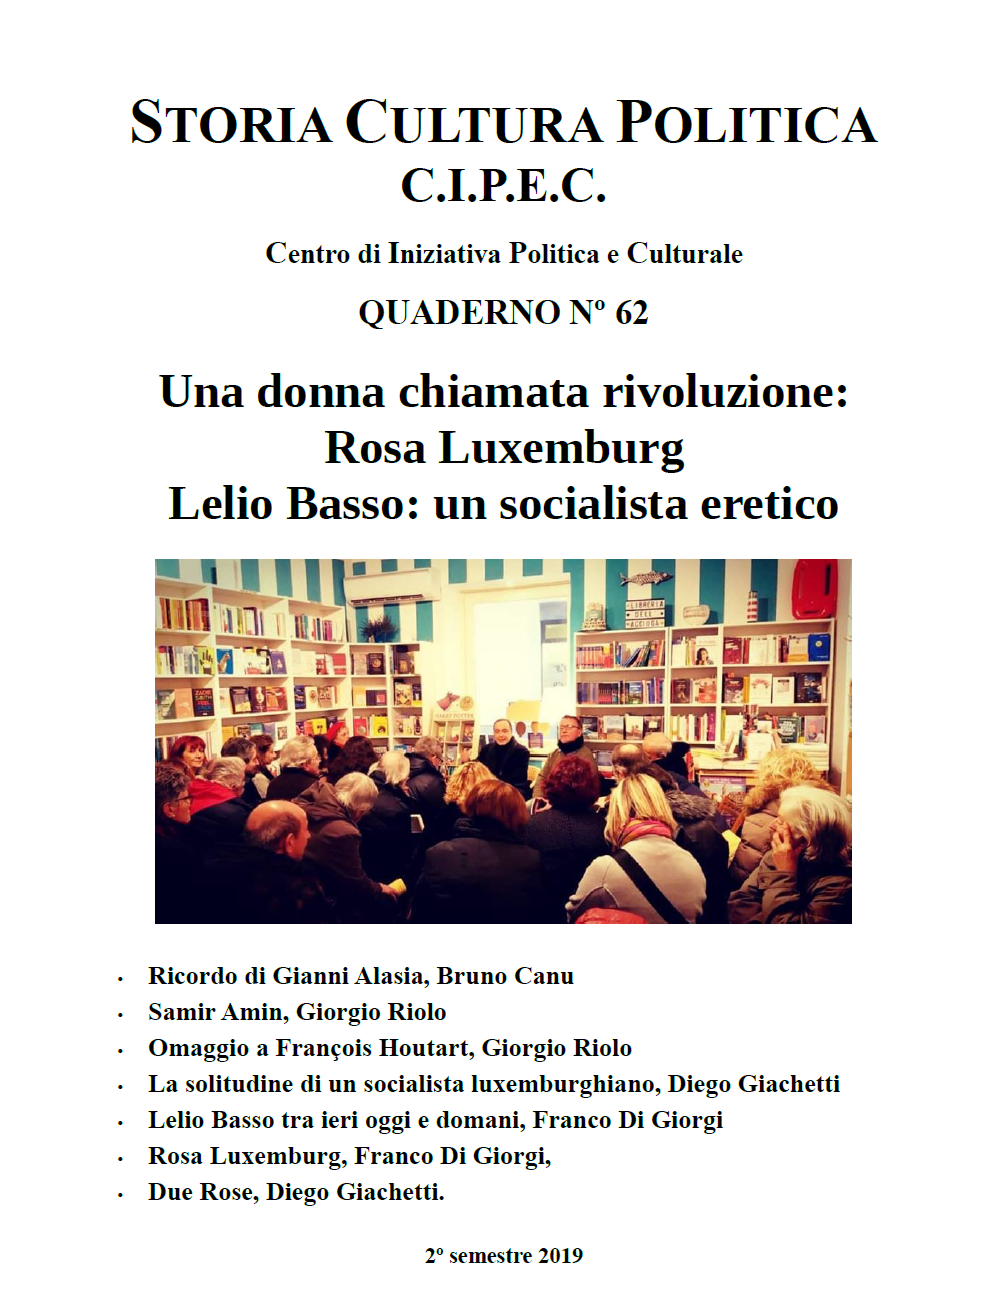 Copertina del quaderno CIPEC Numero 62